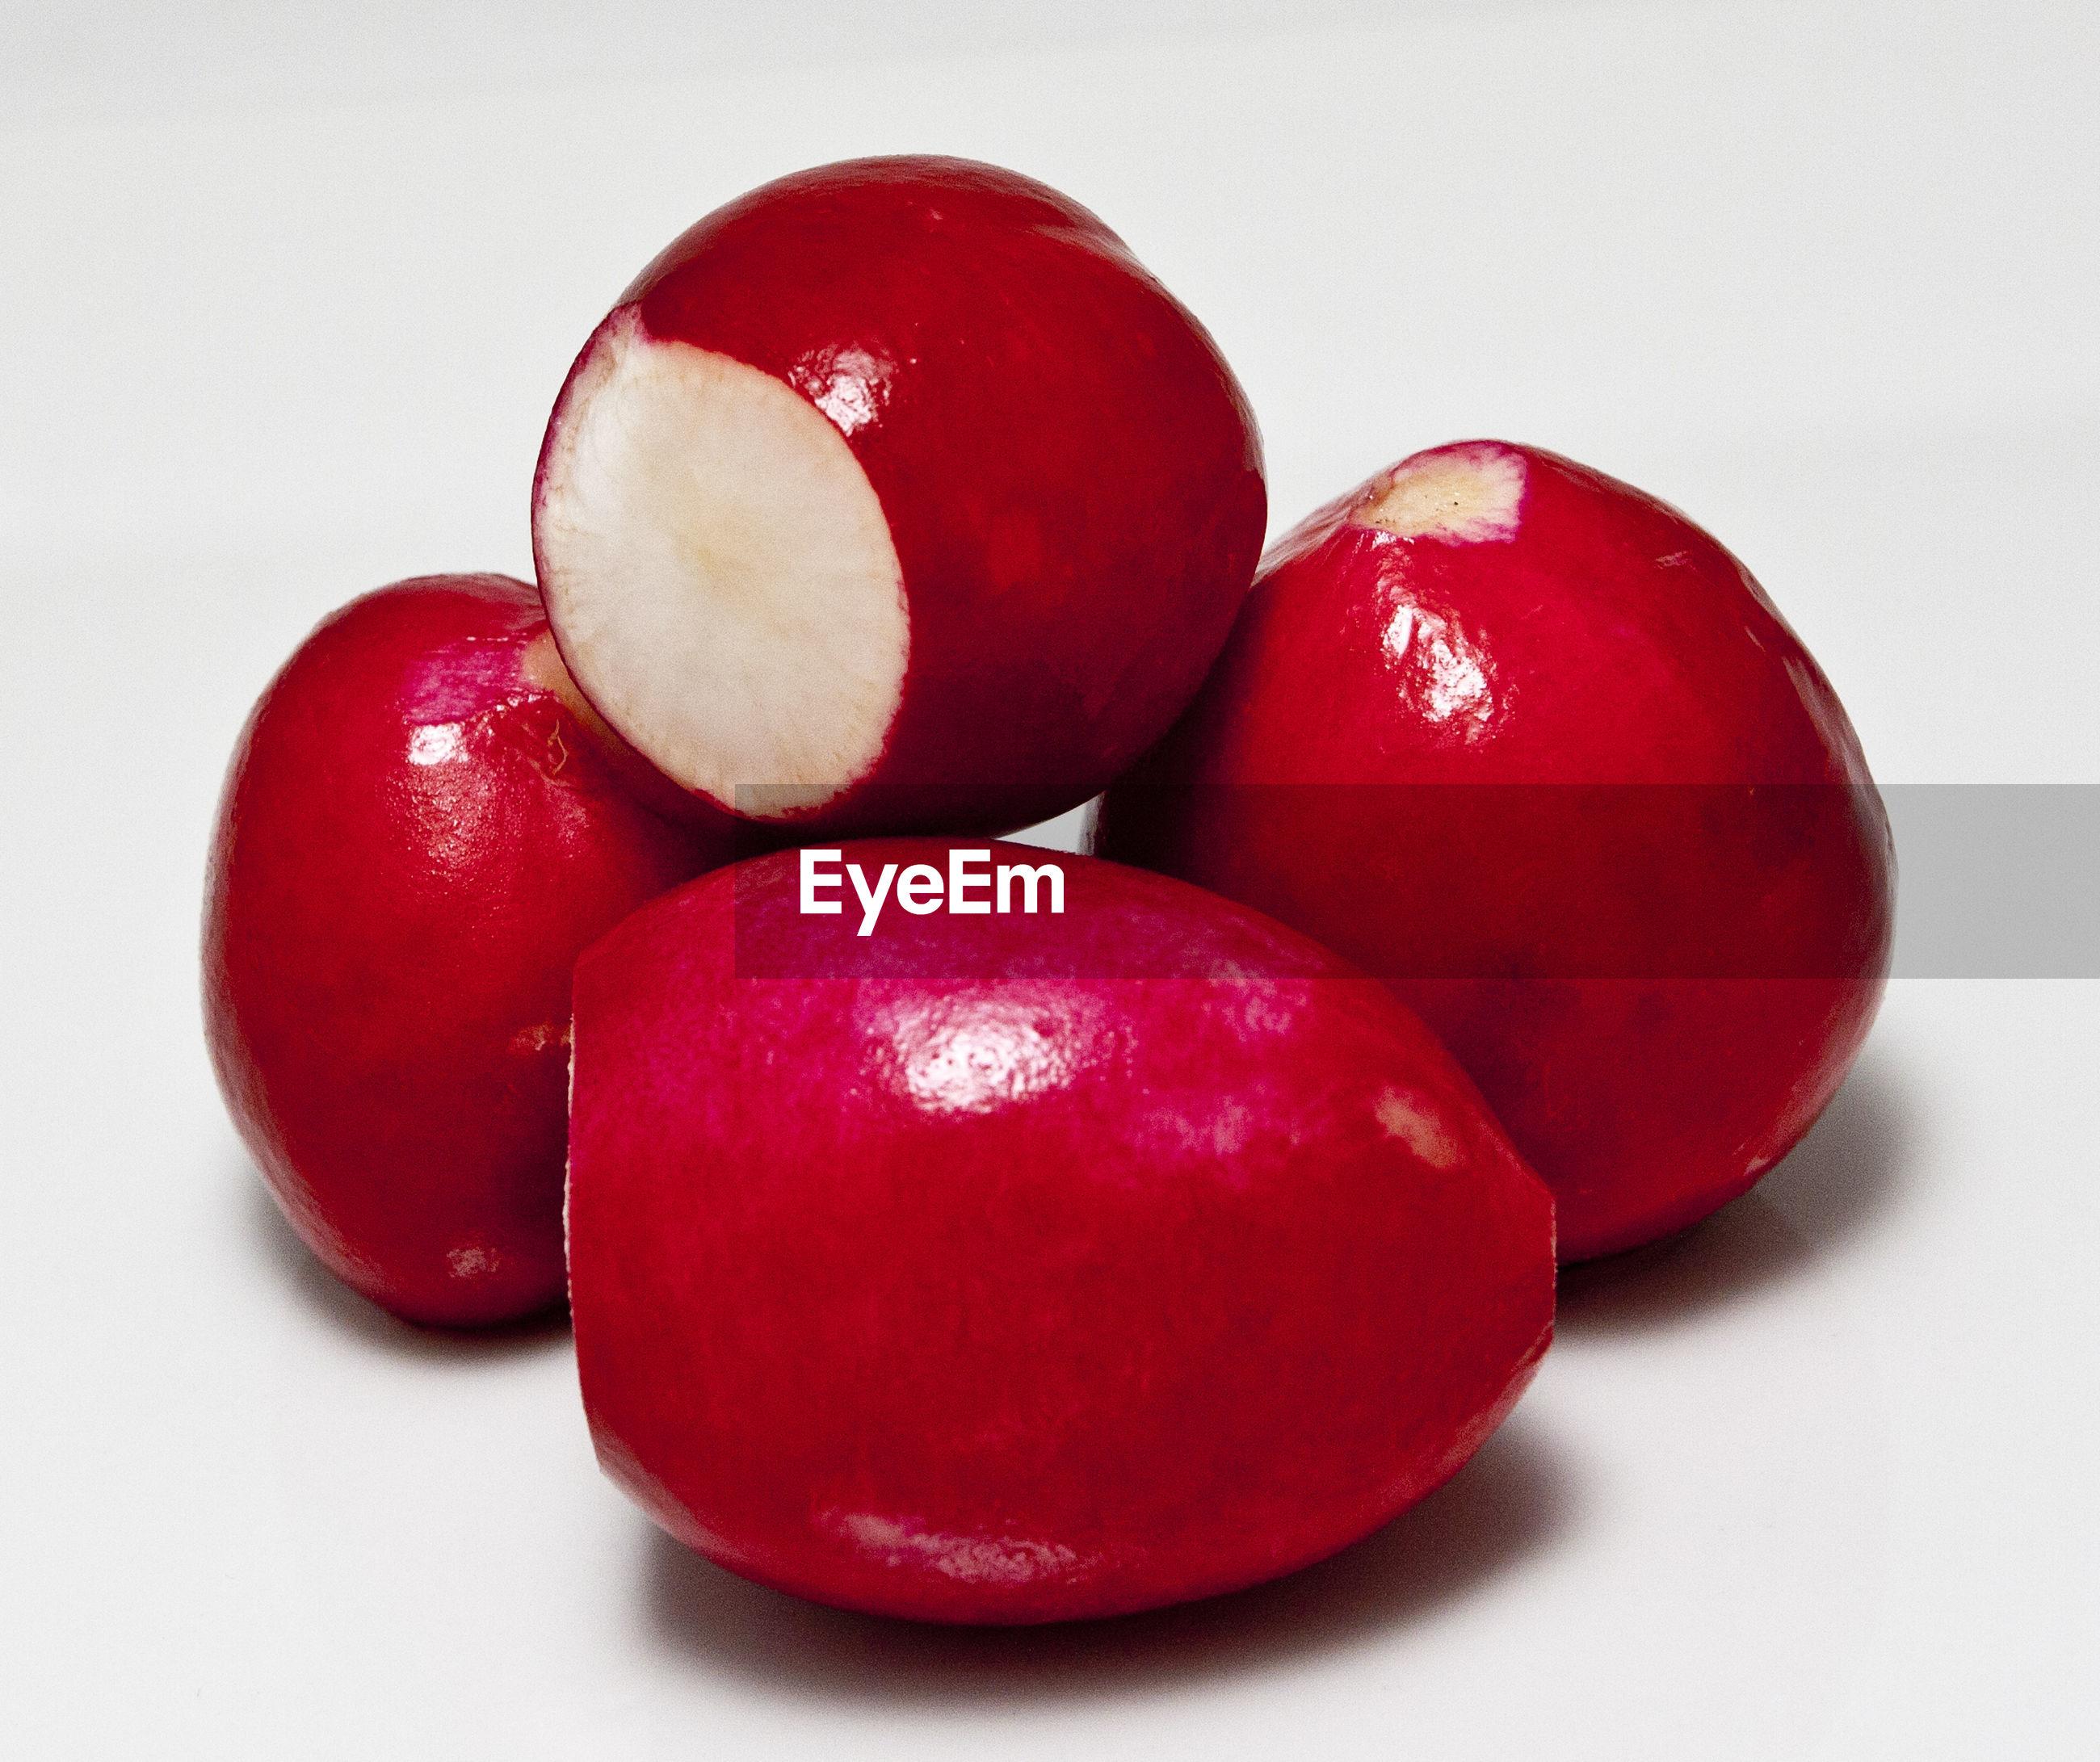 Close-up of radishes against white background